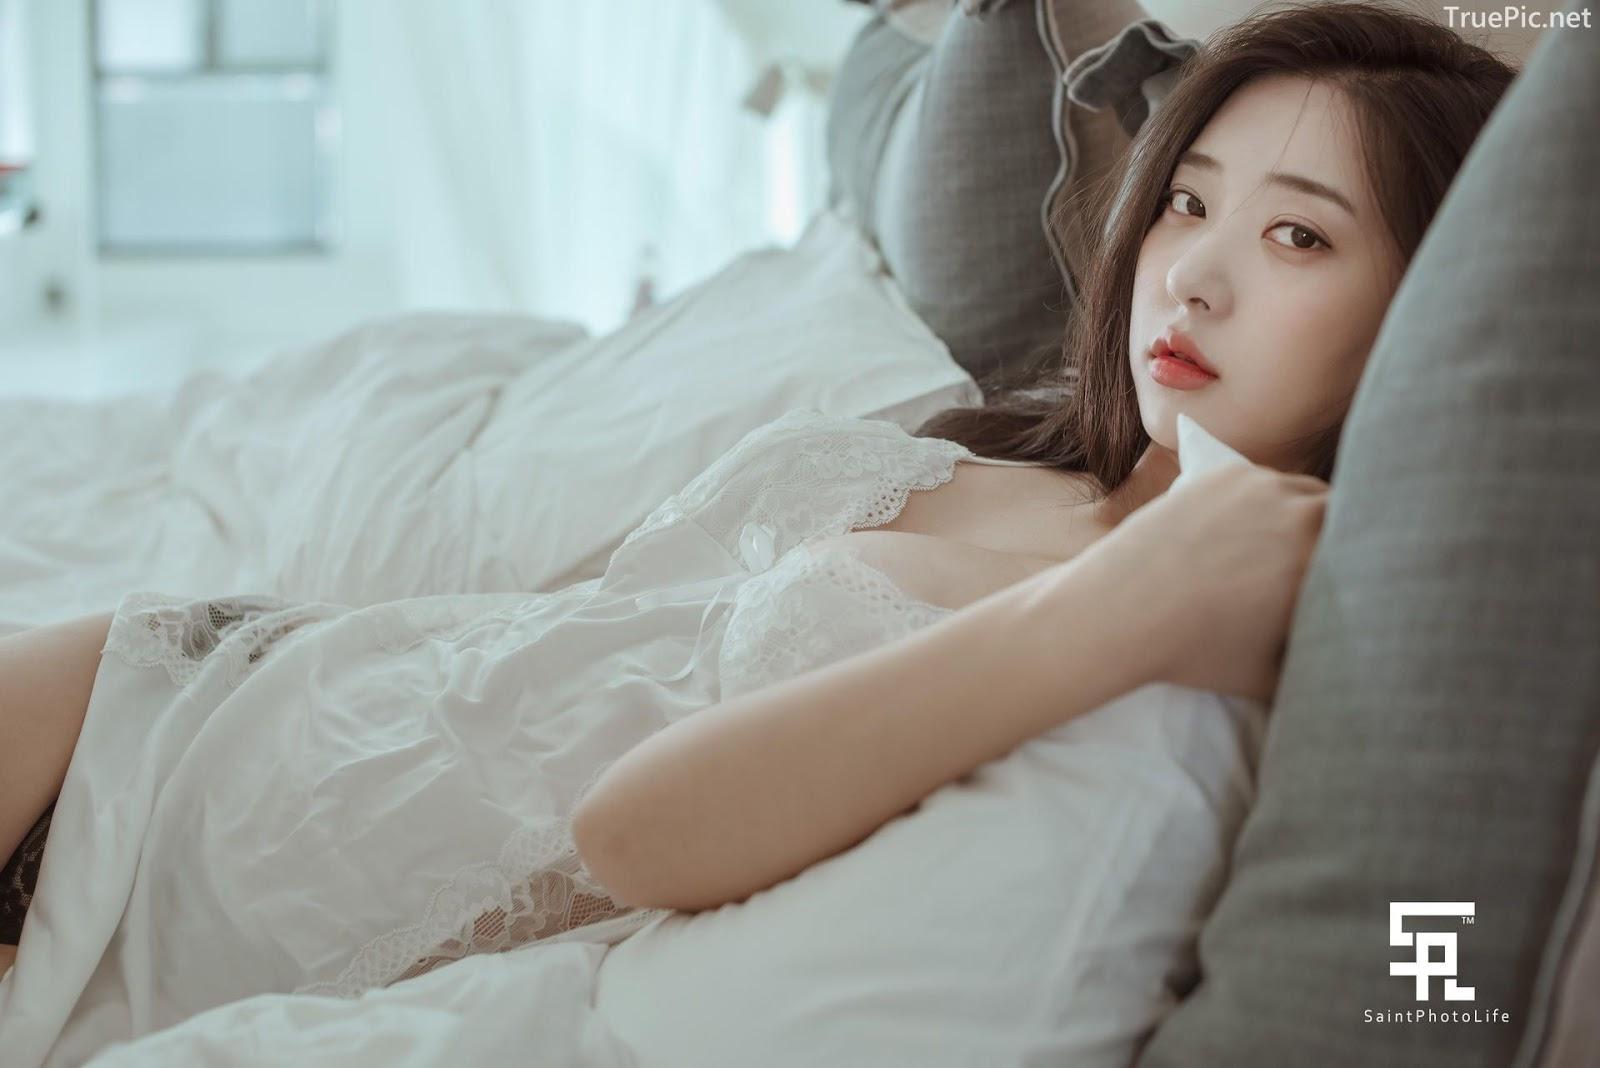 Korean hot model and fashion - Shin Jae Eun - Various Sets collection - Picture 7